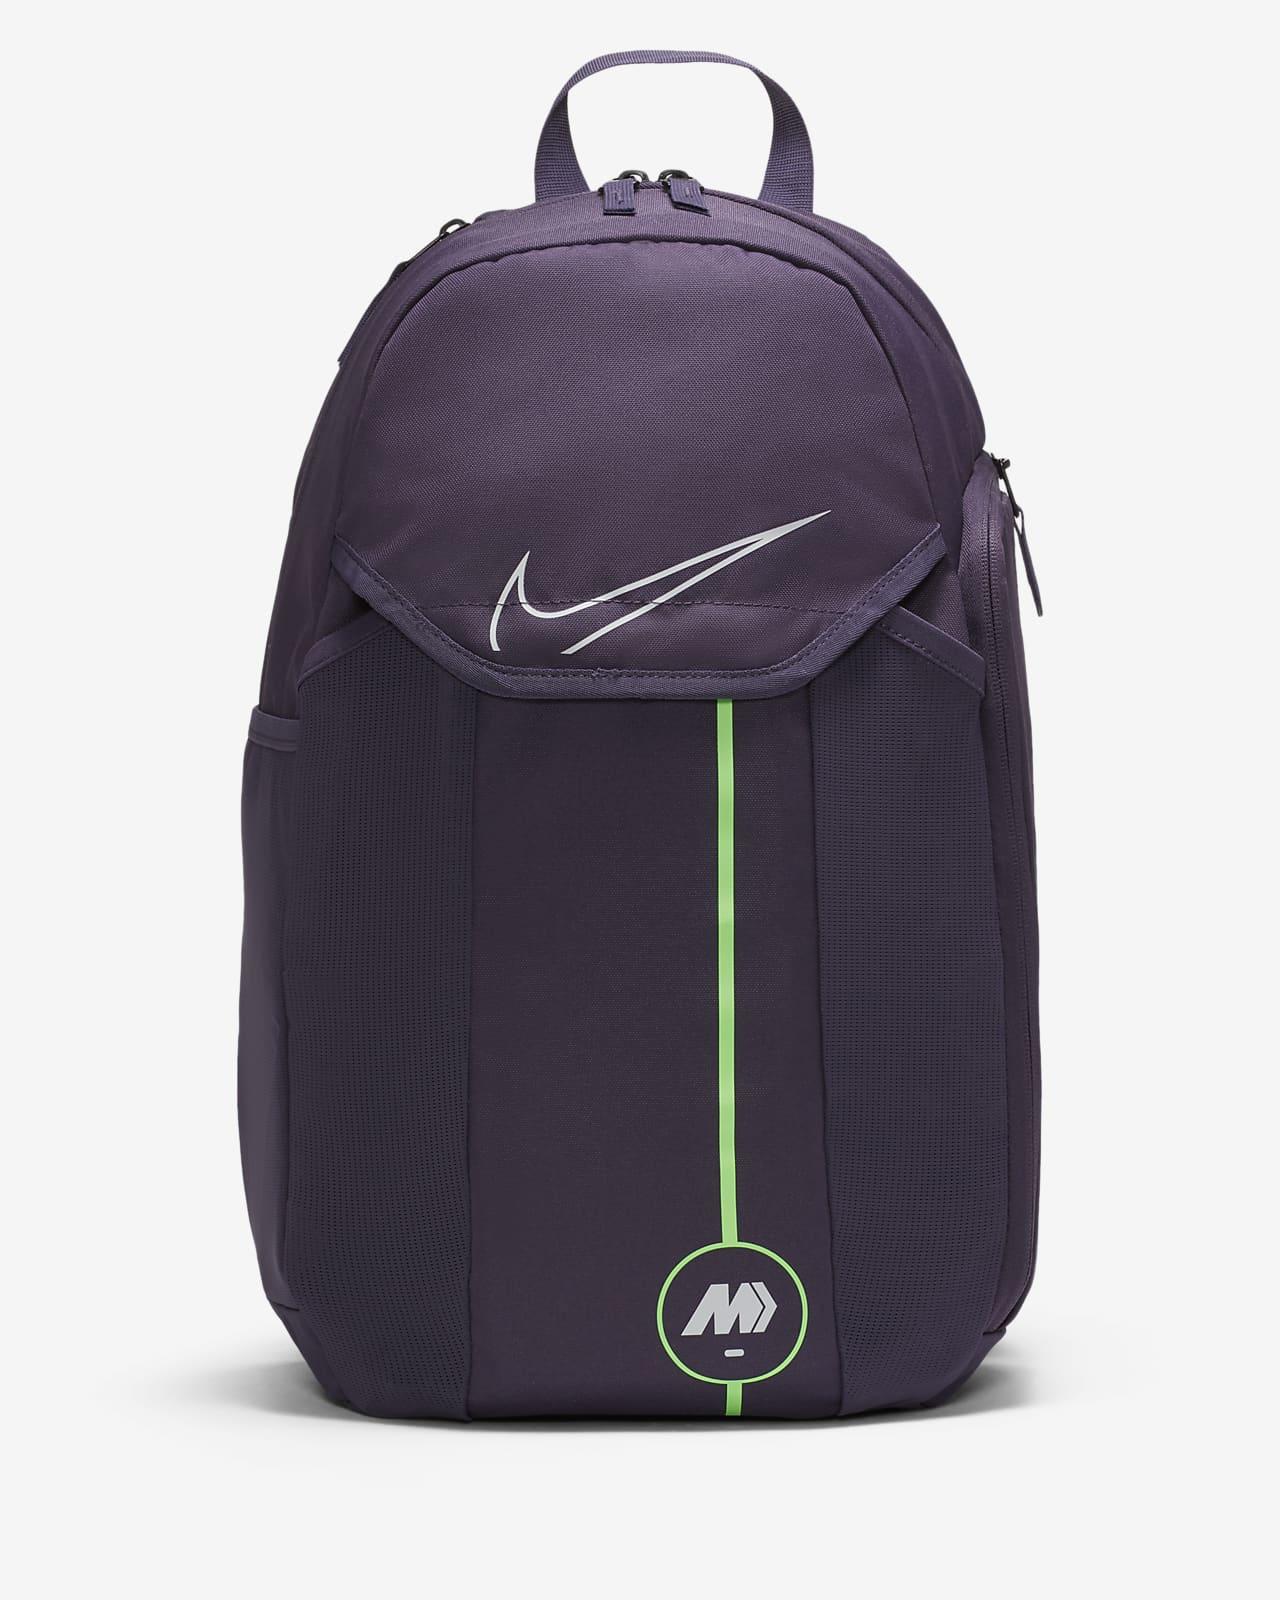 Nike Mercurial Football Backpack